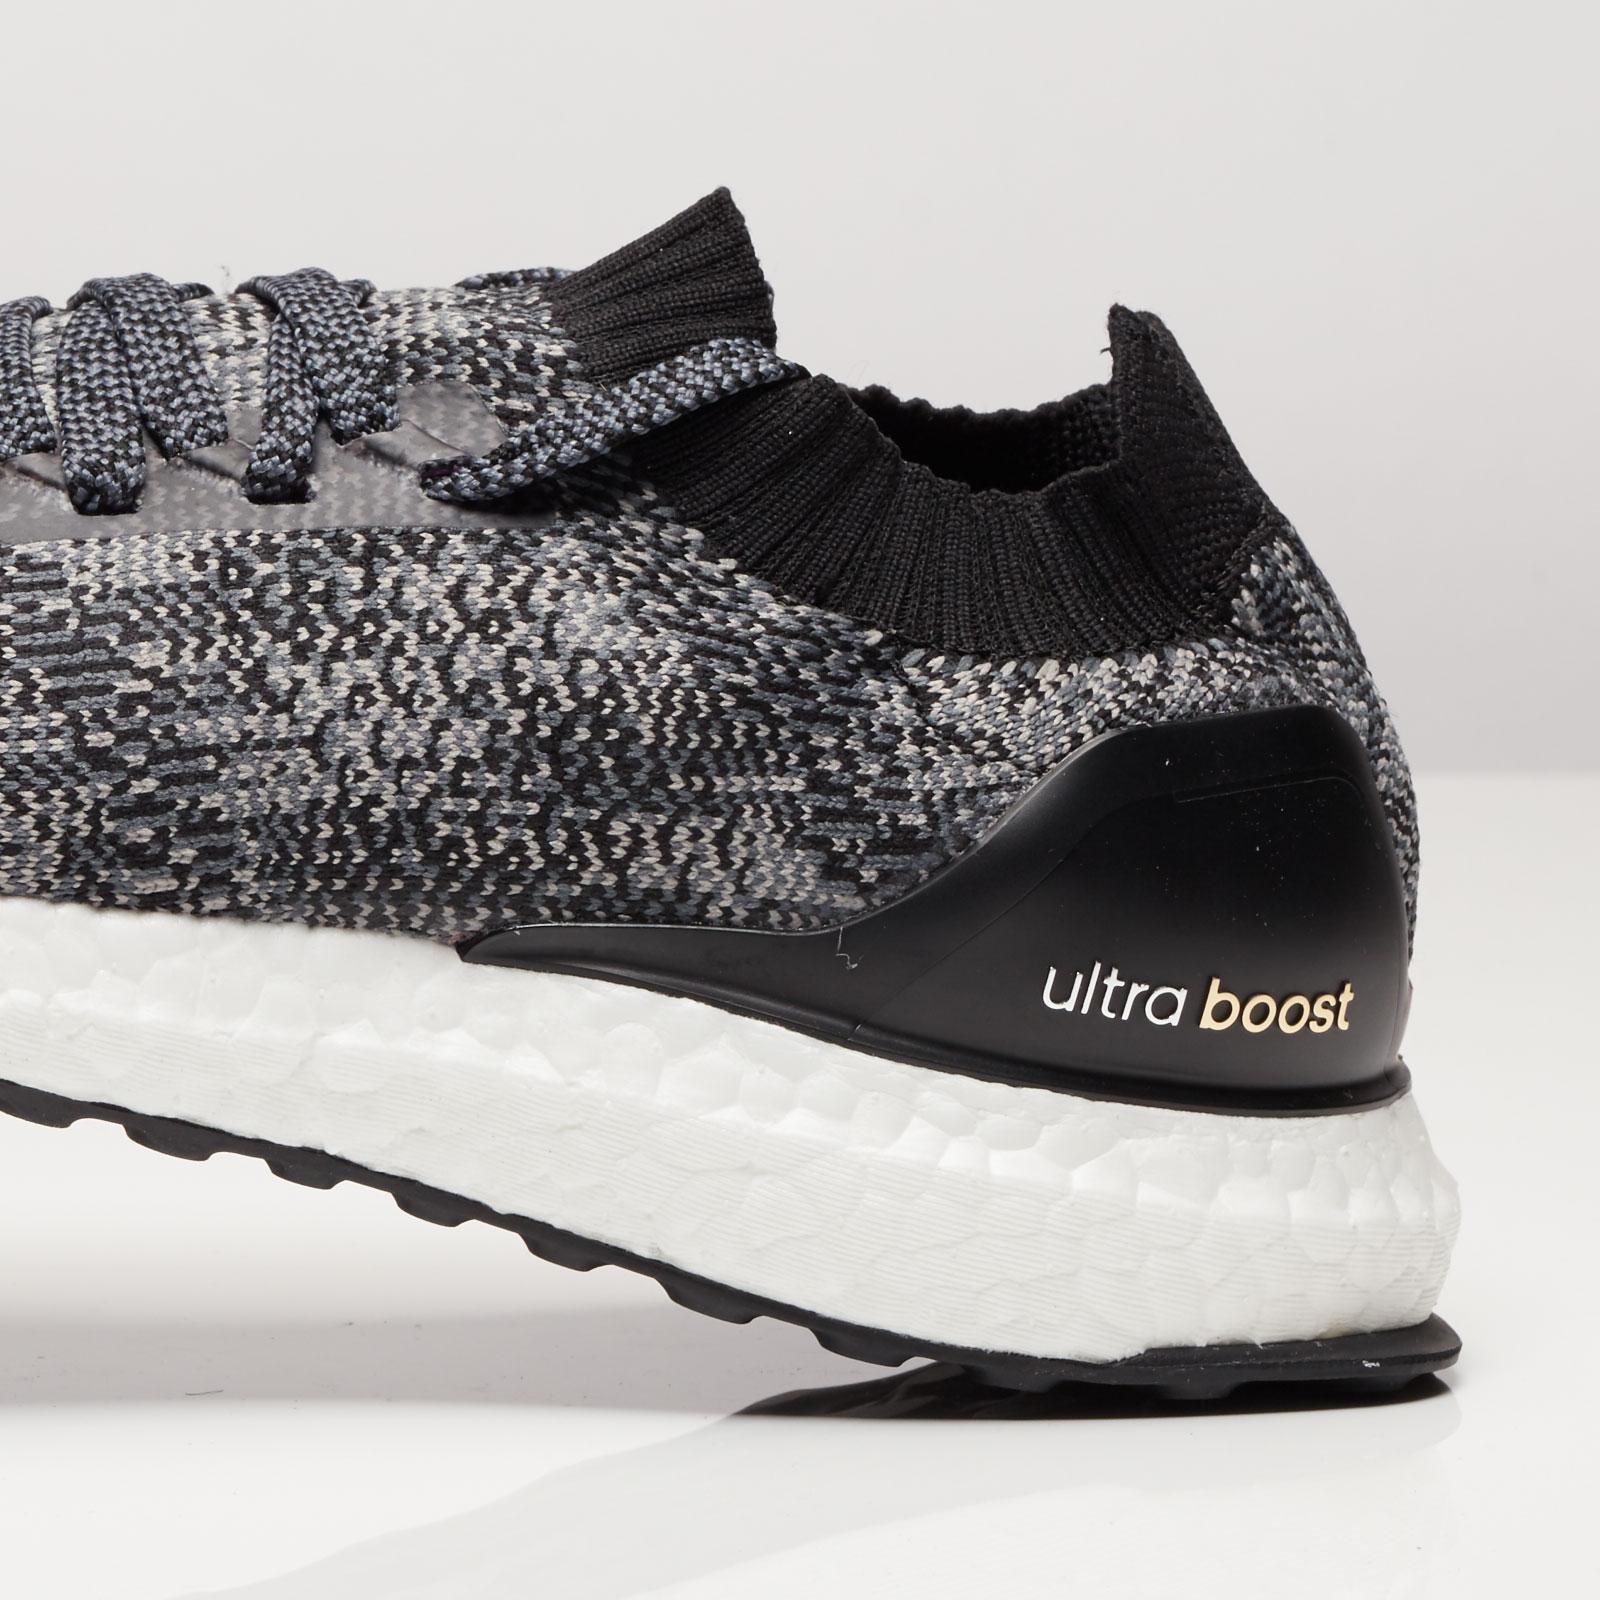 05cd6c572a0b adidas Ultra Boost Uncaged W - Bb3904 - Sneakersnstuff